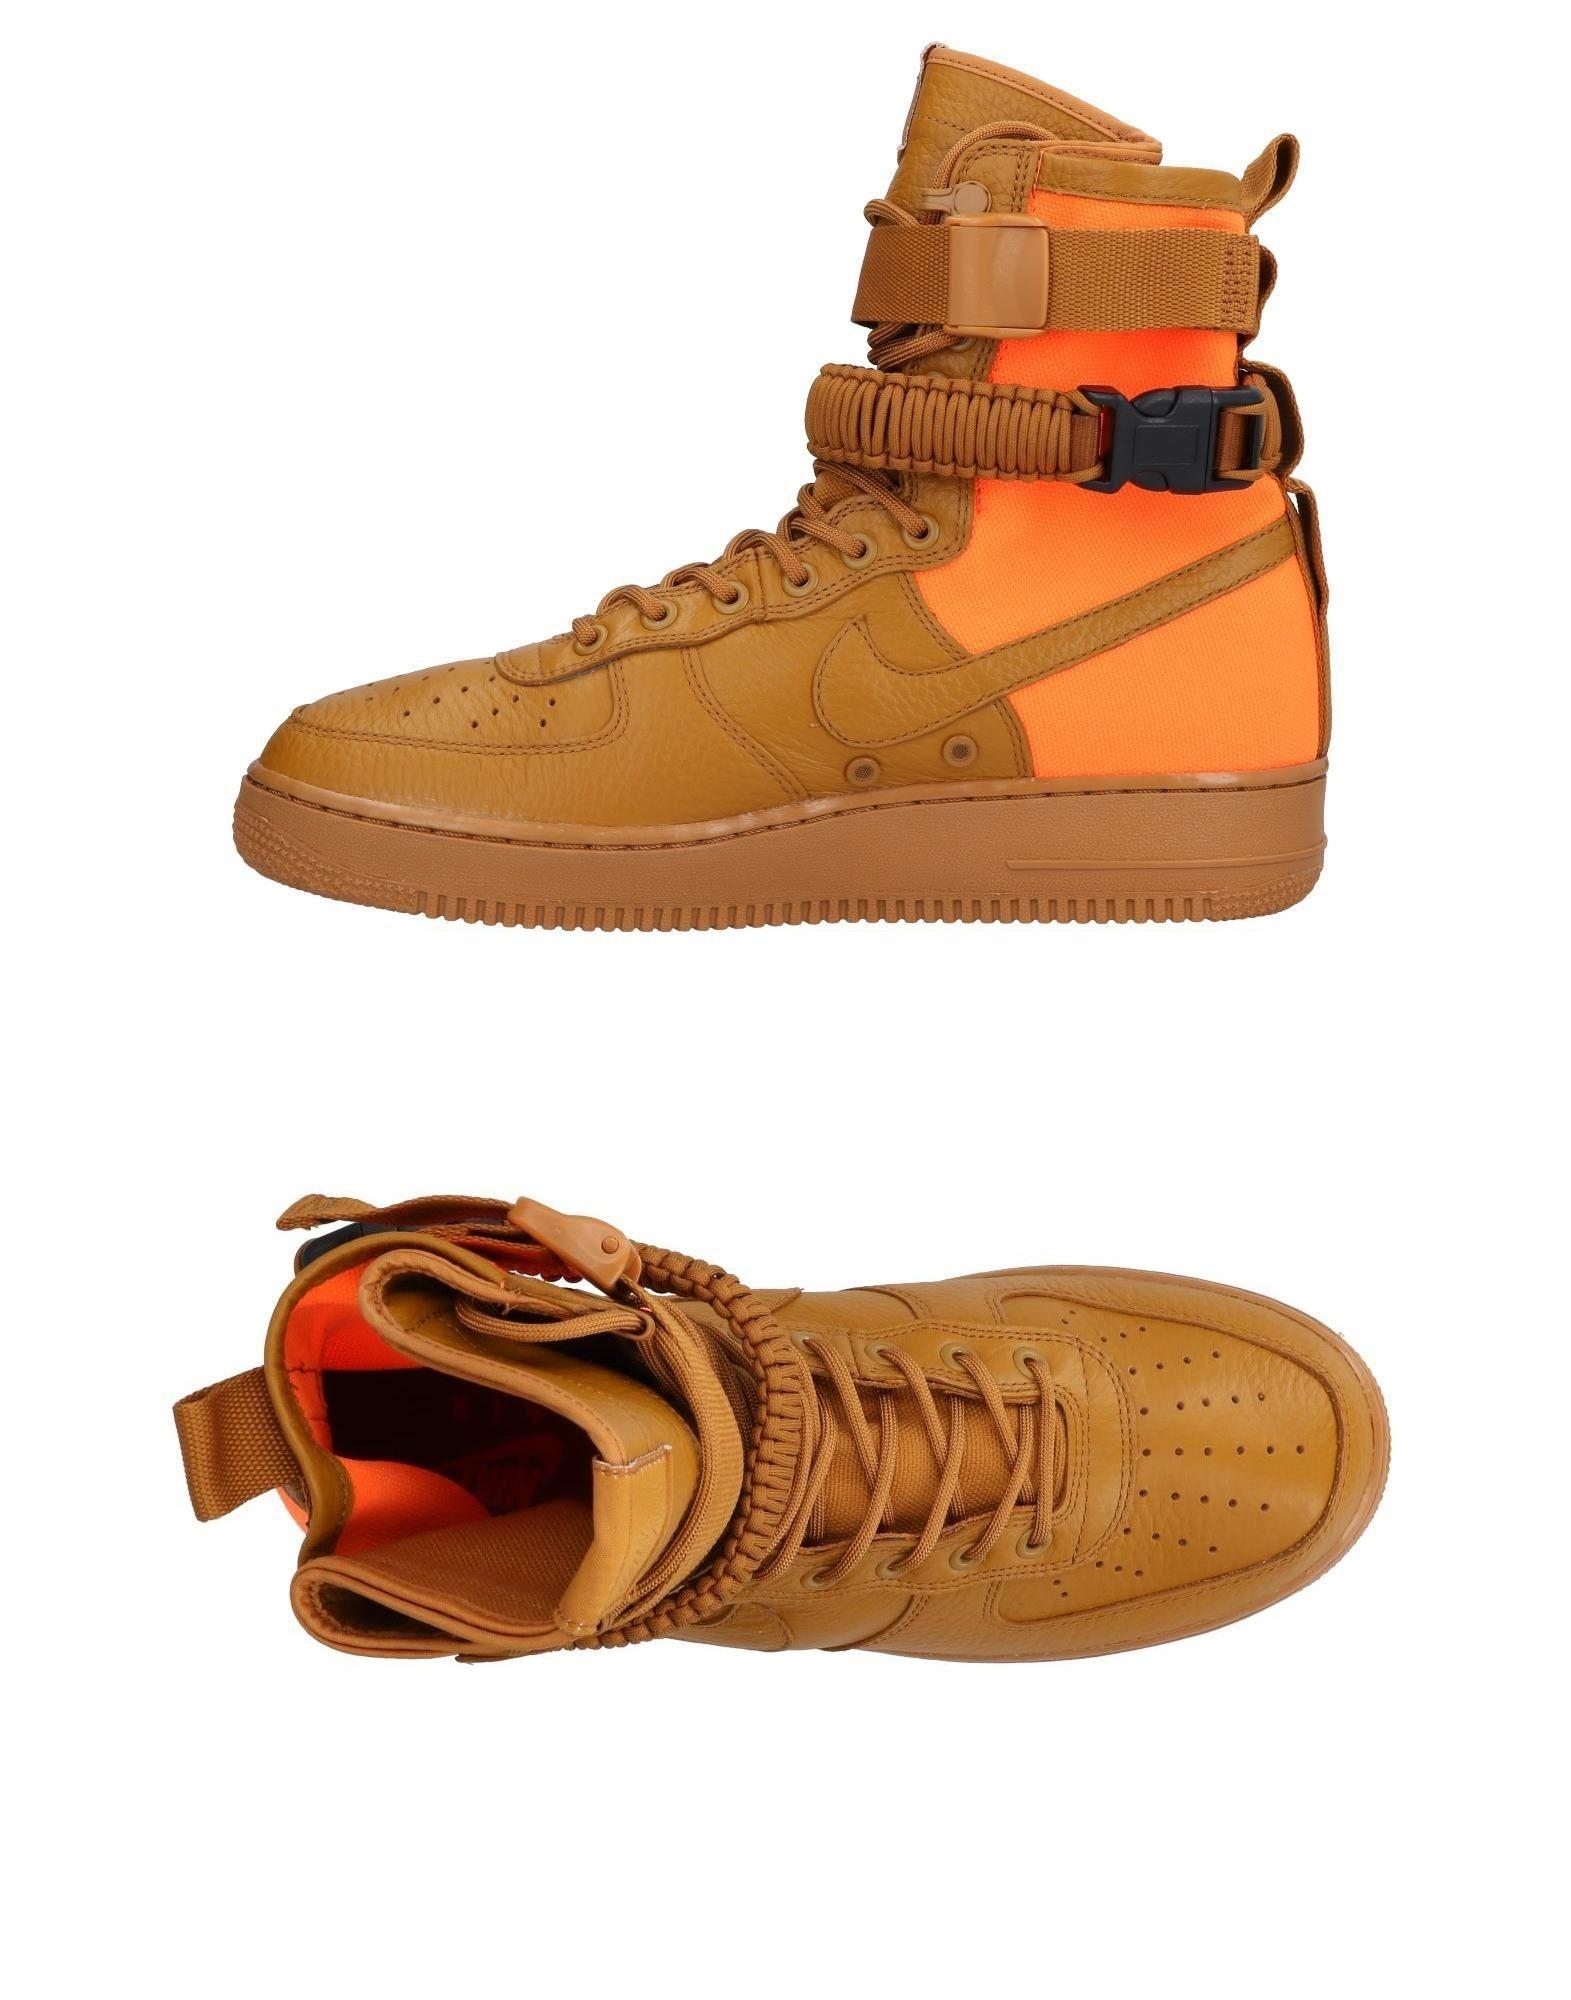 Turnscarpe Nike uomo - 11487053CD 11487053CD